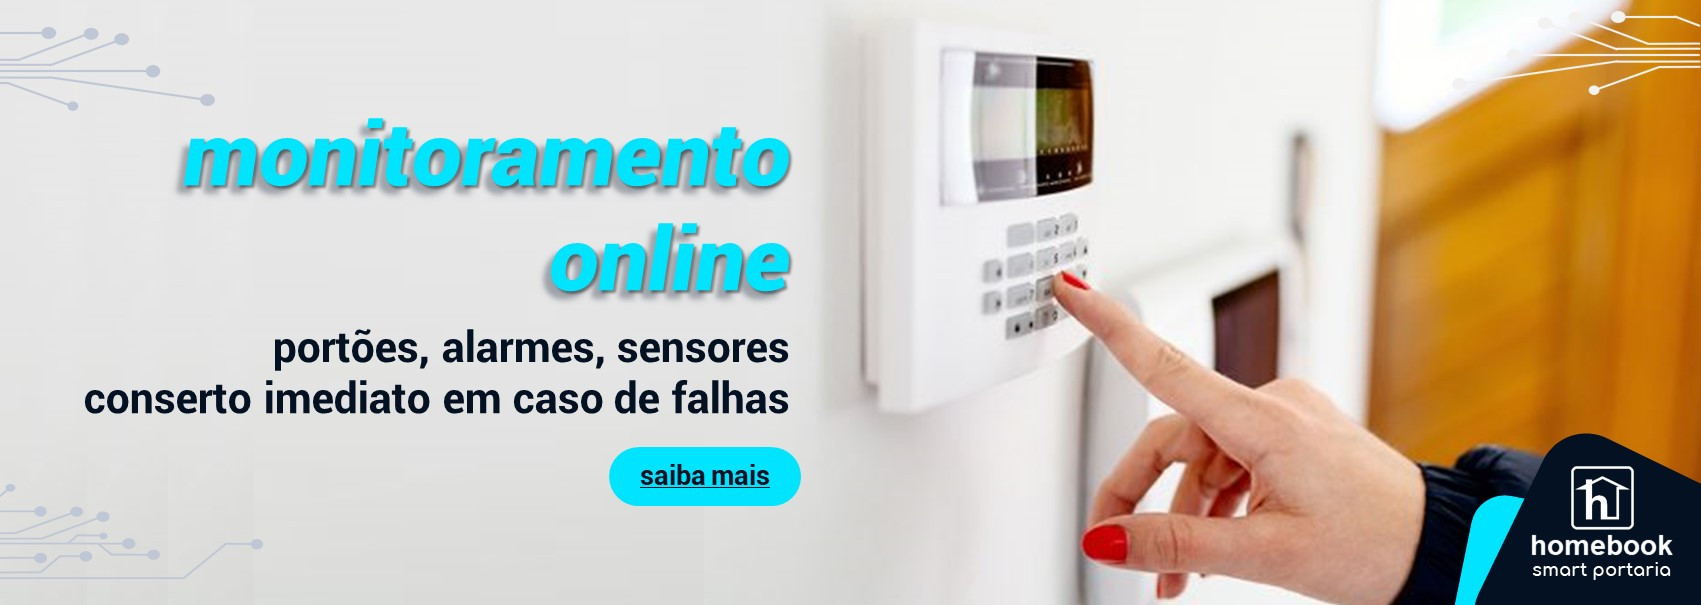 Homebook-Portaria-Remota-Robotizada-Monitoramento-Online-Portoes-Alames-Sensores